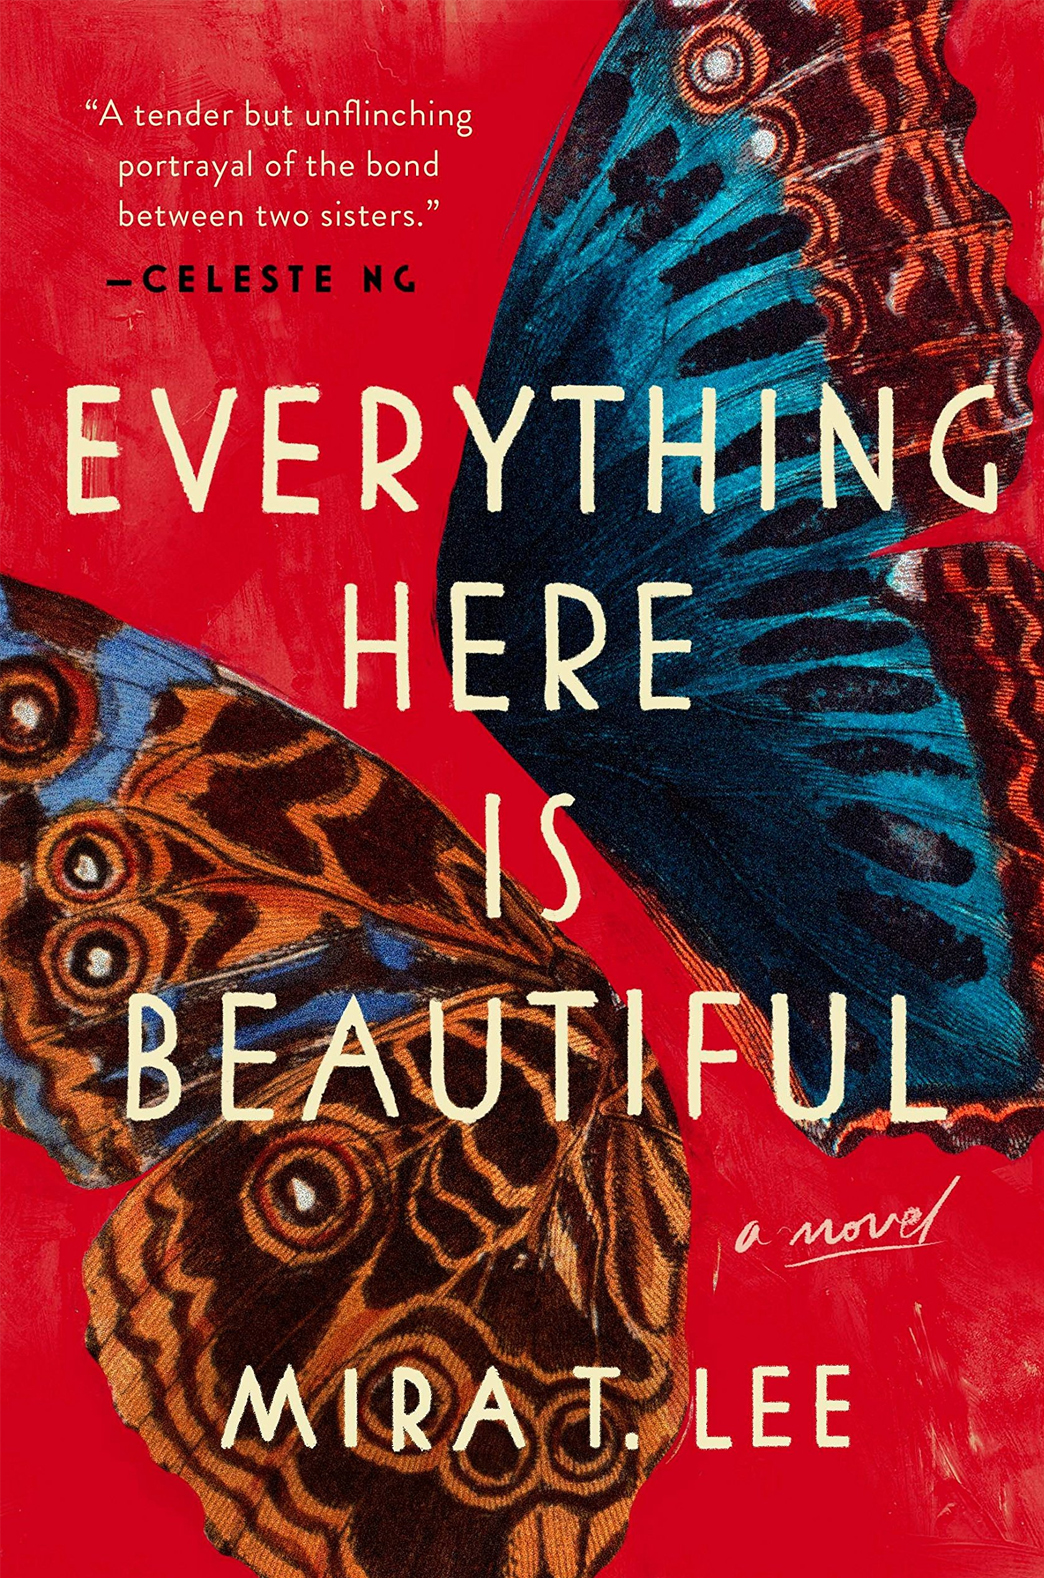 kathleen stone writer booklab literary salon everything here Is beautiful mira t lee